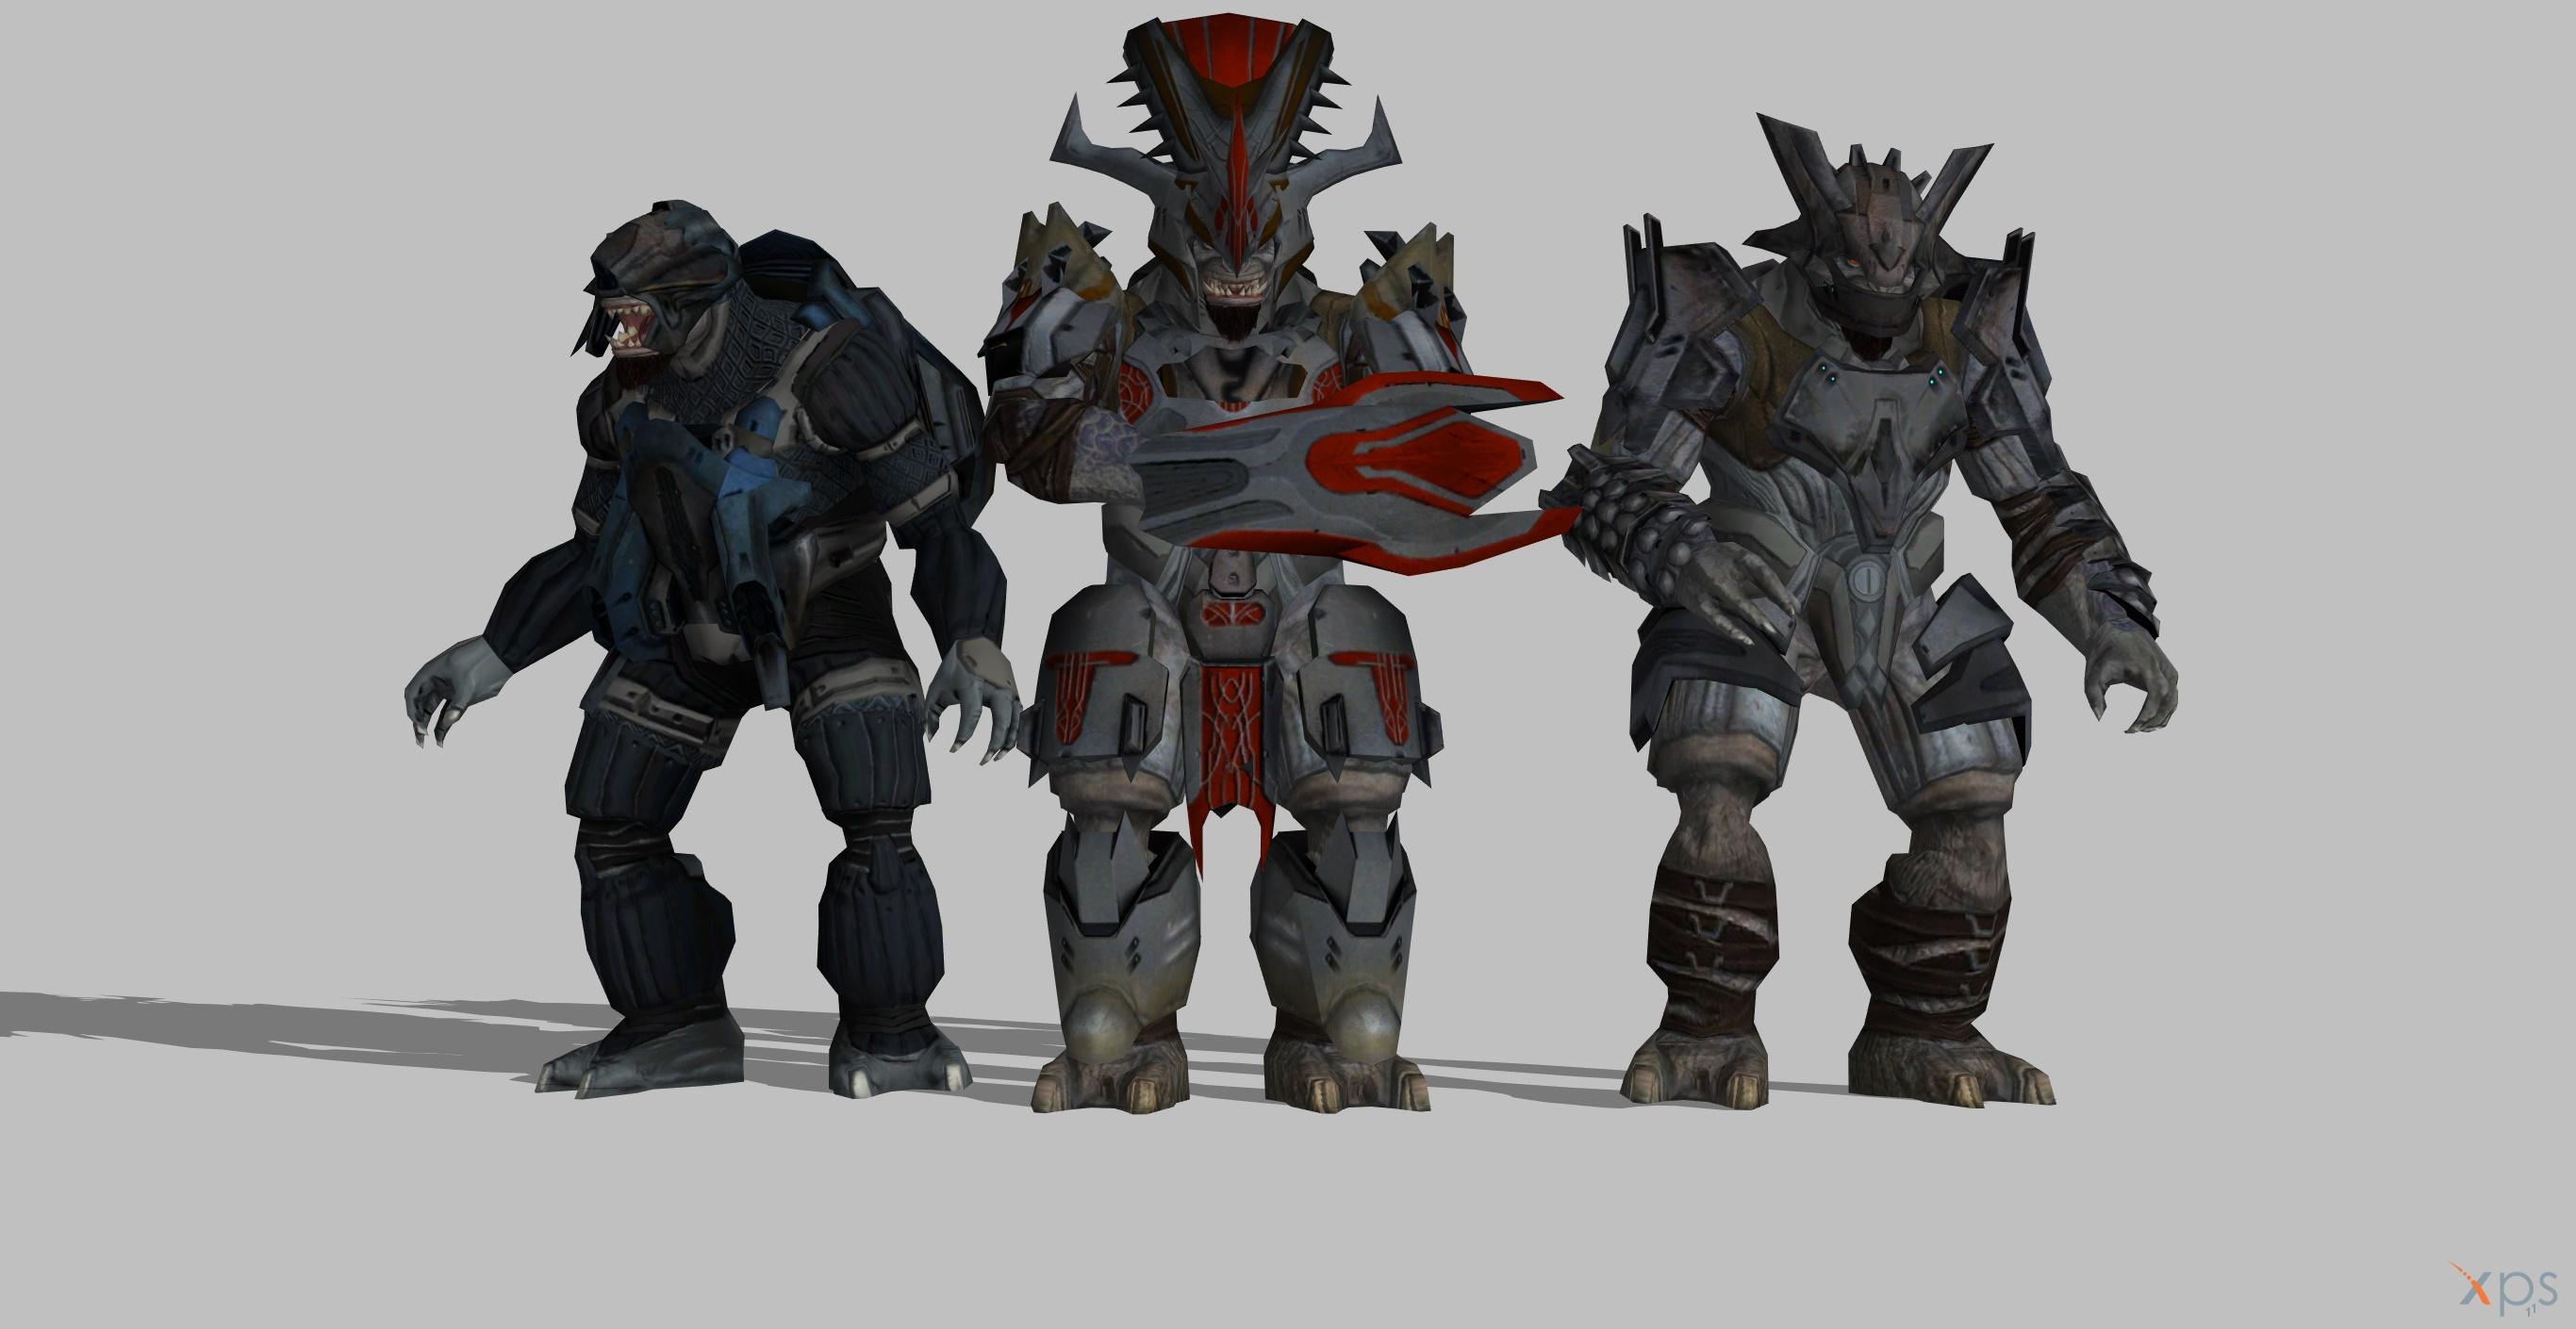 Halo 3 Brutes by BlinkJisooXPS on DeviantArt